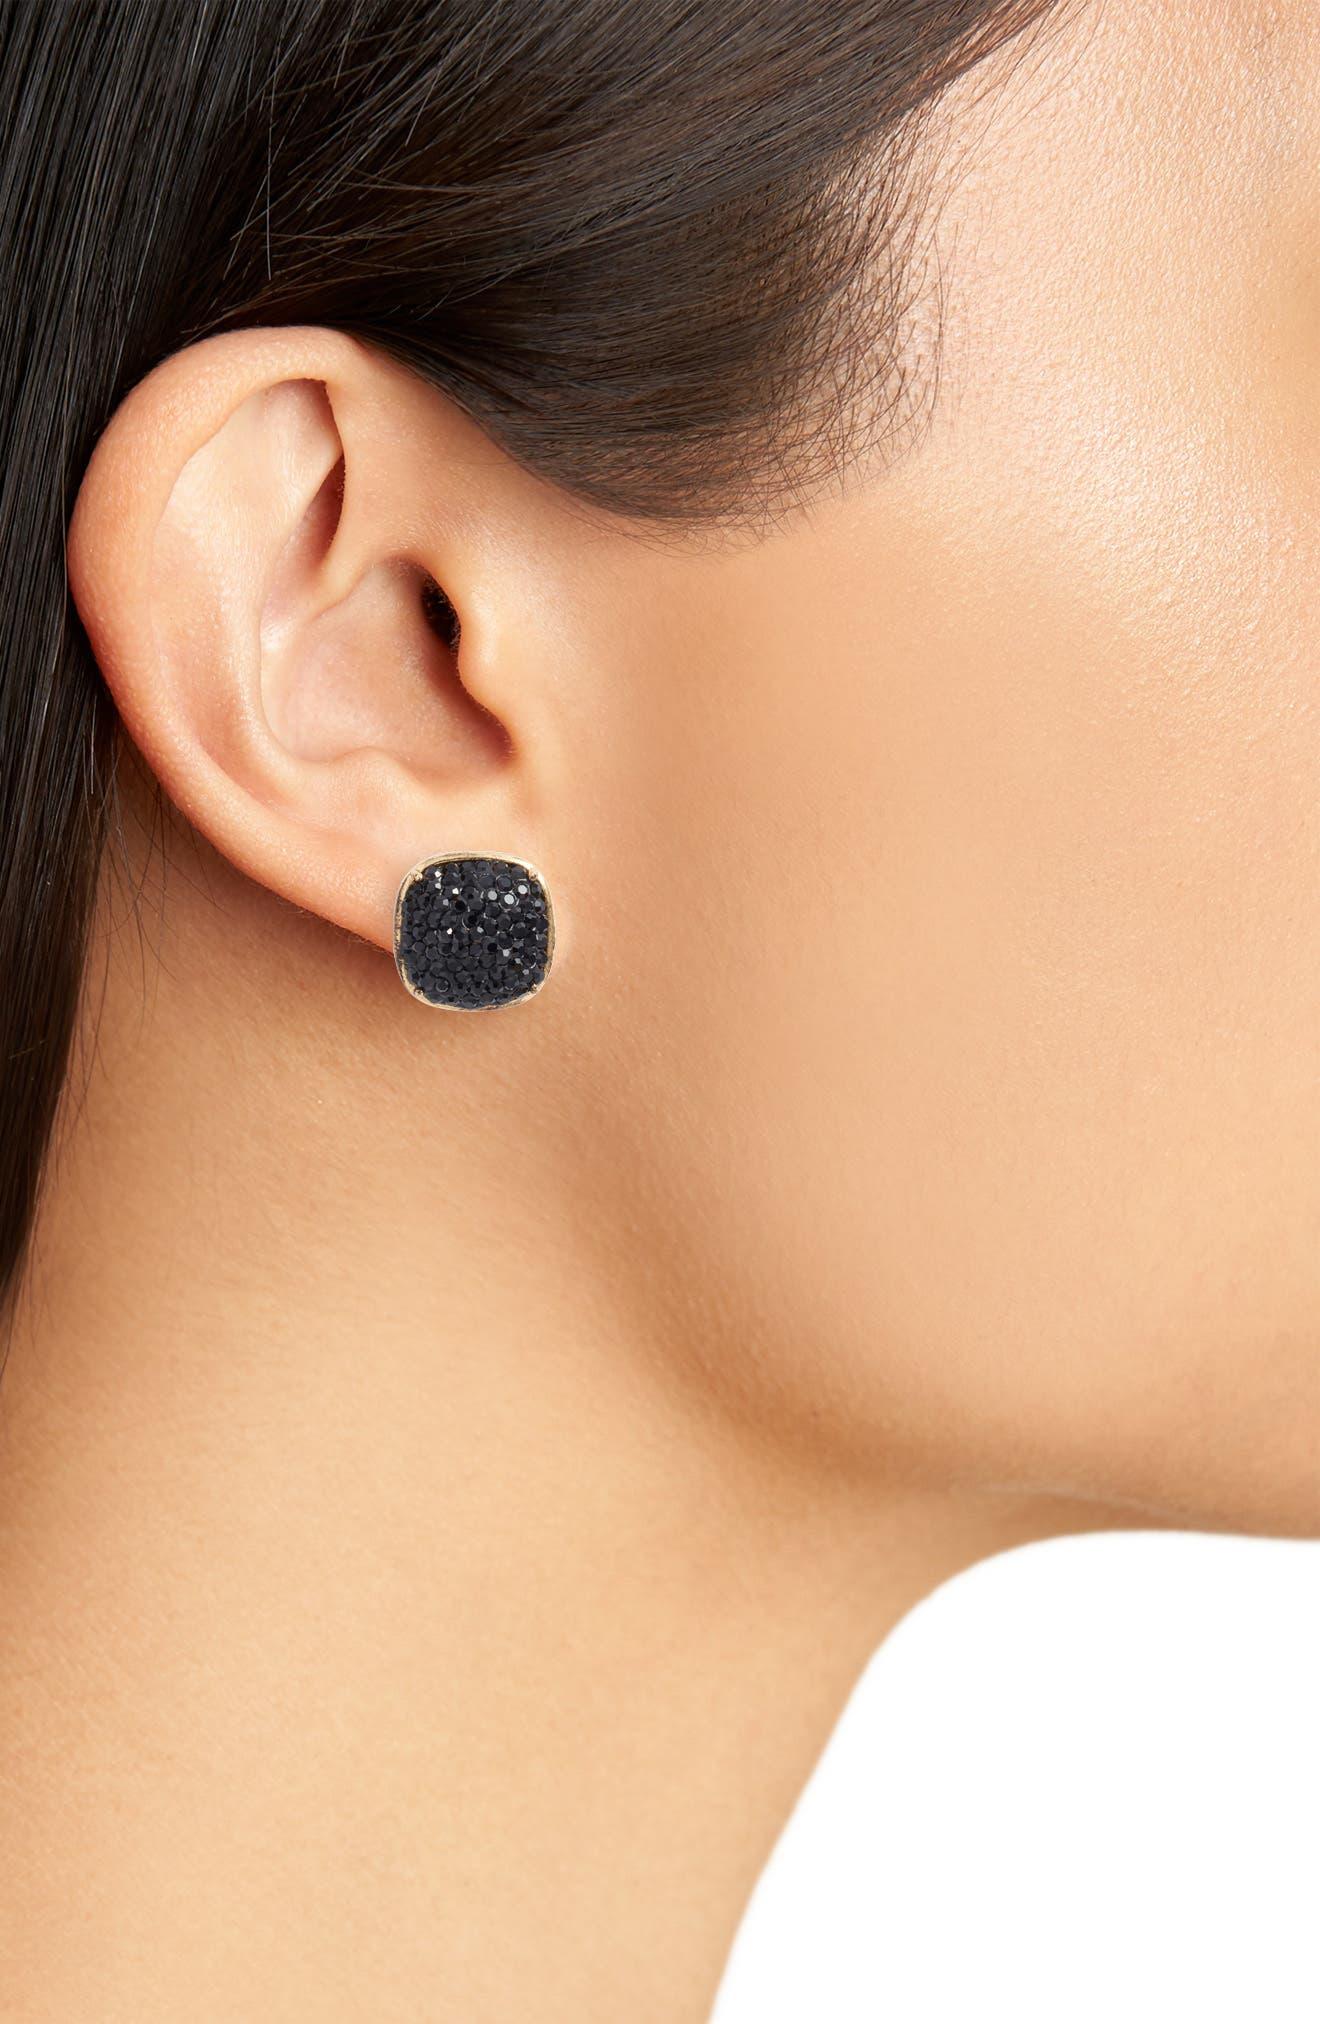 KATE SPADE NEW YORK, pavé small square stud earrings, Alternate thumbnail 2, color, 001